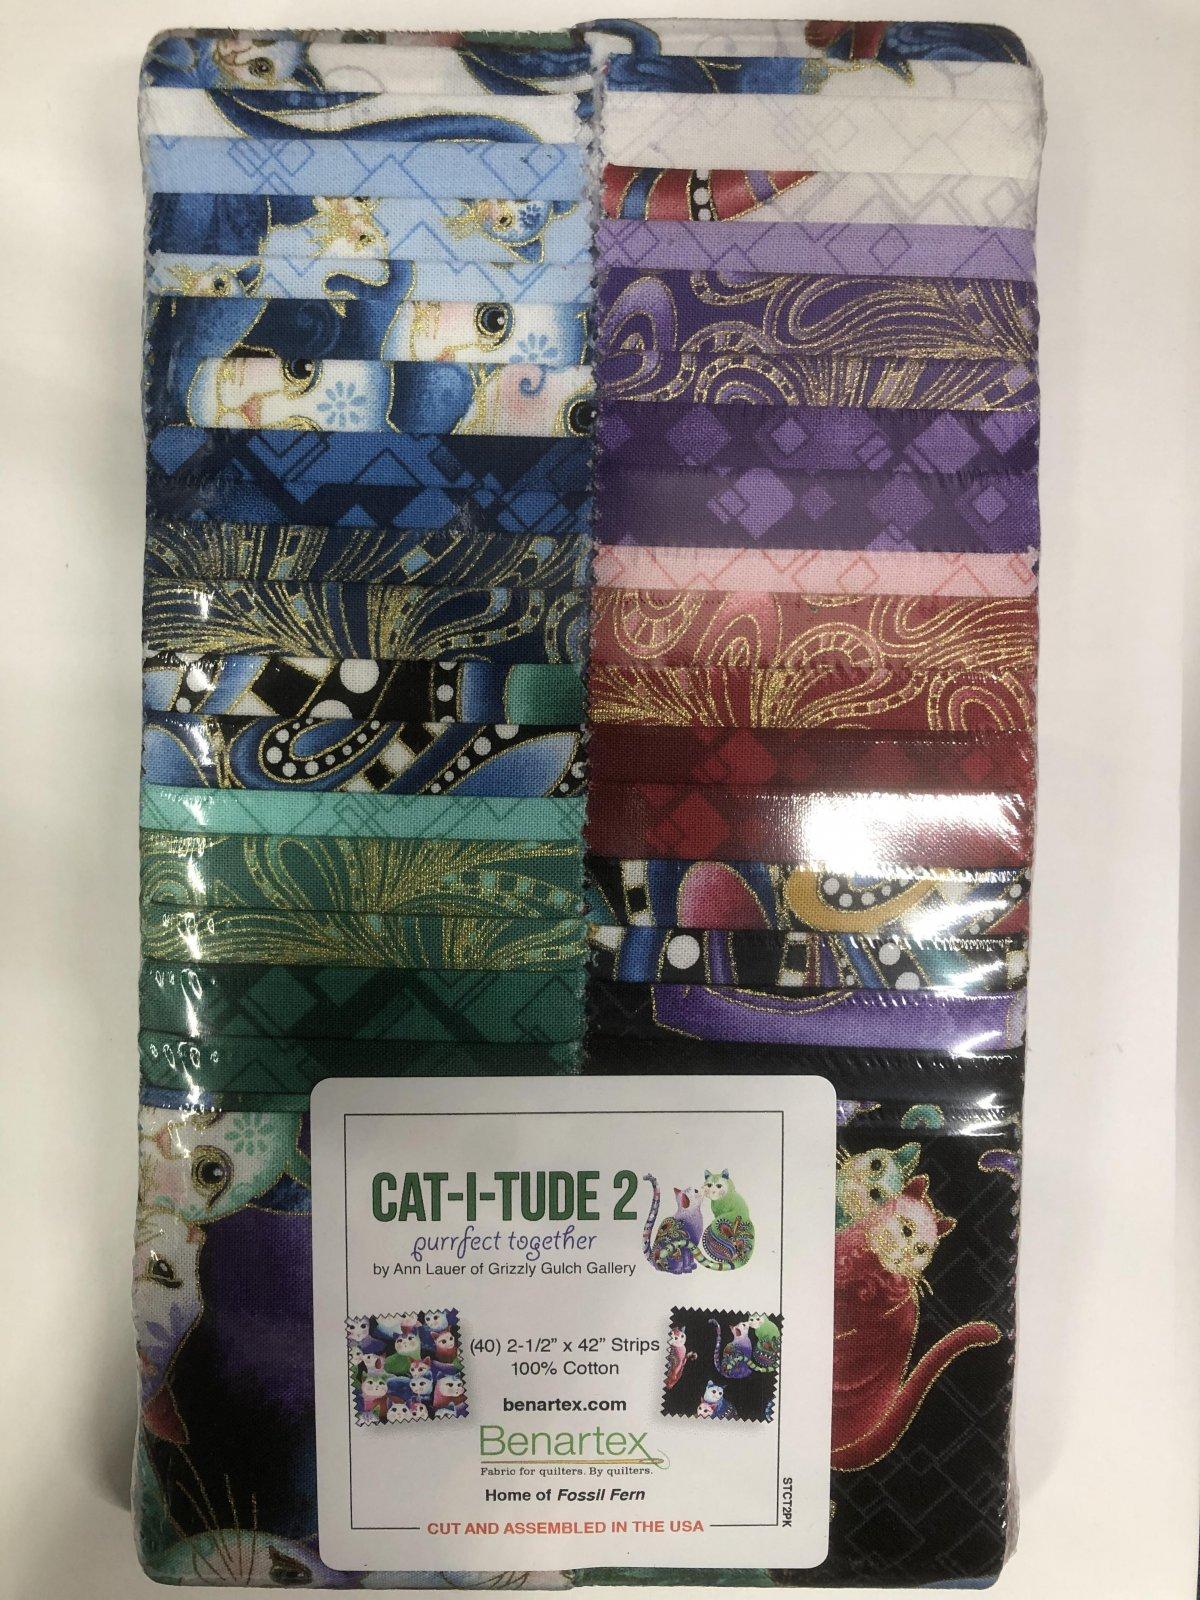 2.5 inch STRIPS:  Cat-i-tude 2 by Benartex - 40 piece 2.5 inch Fabric Strips Flat Pack